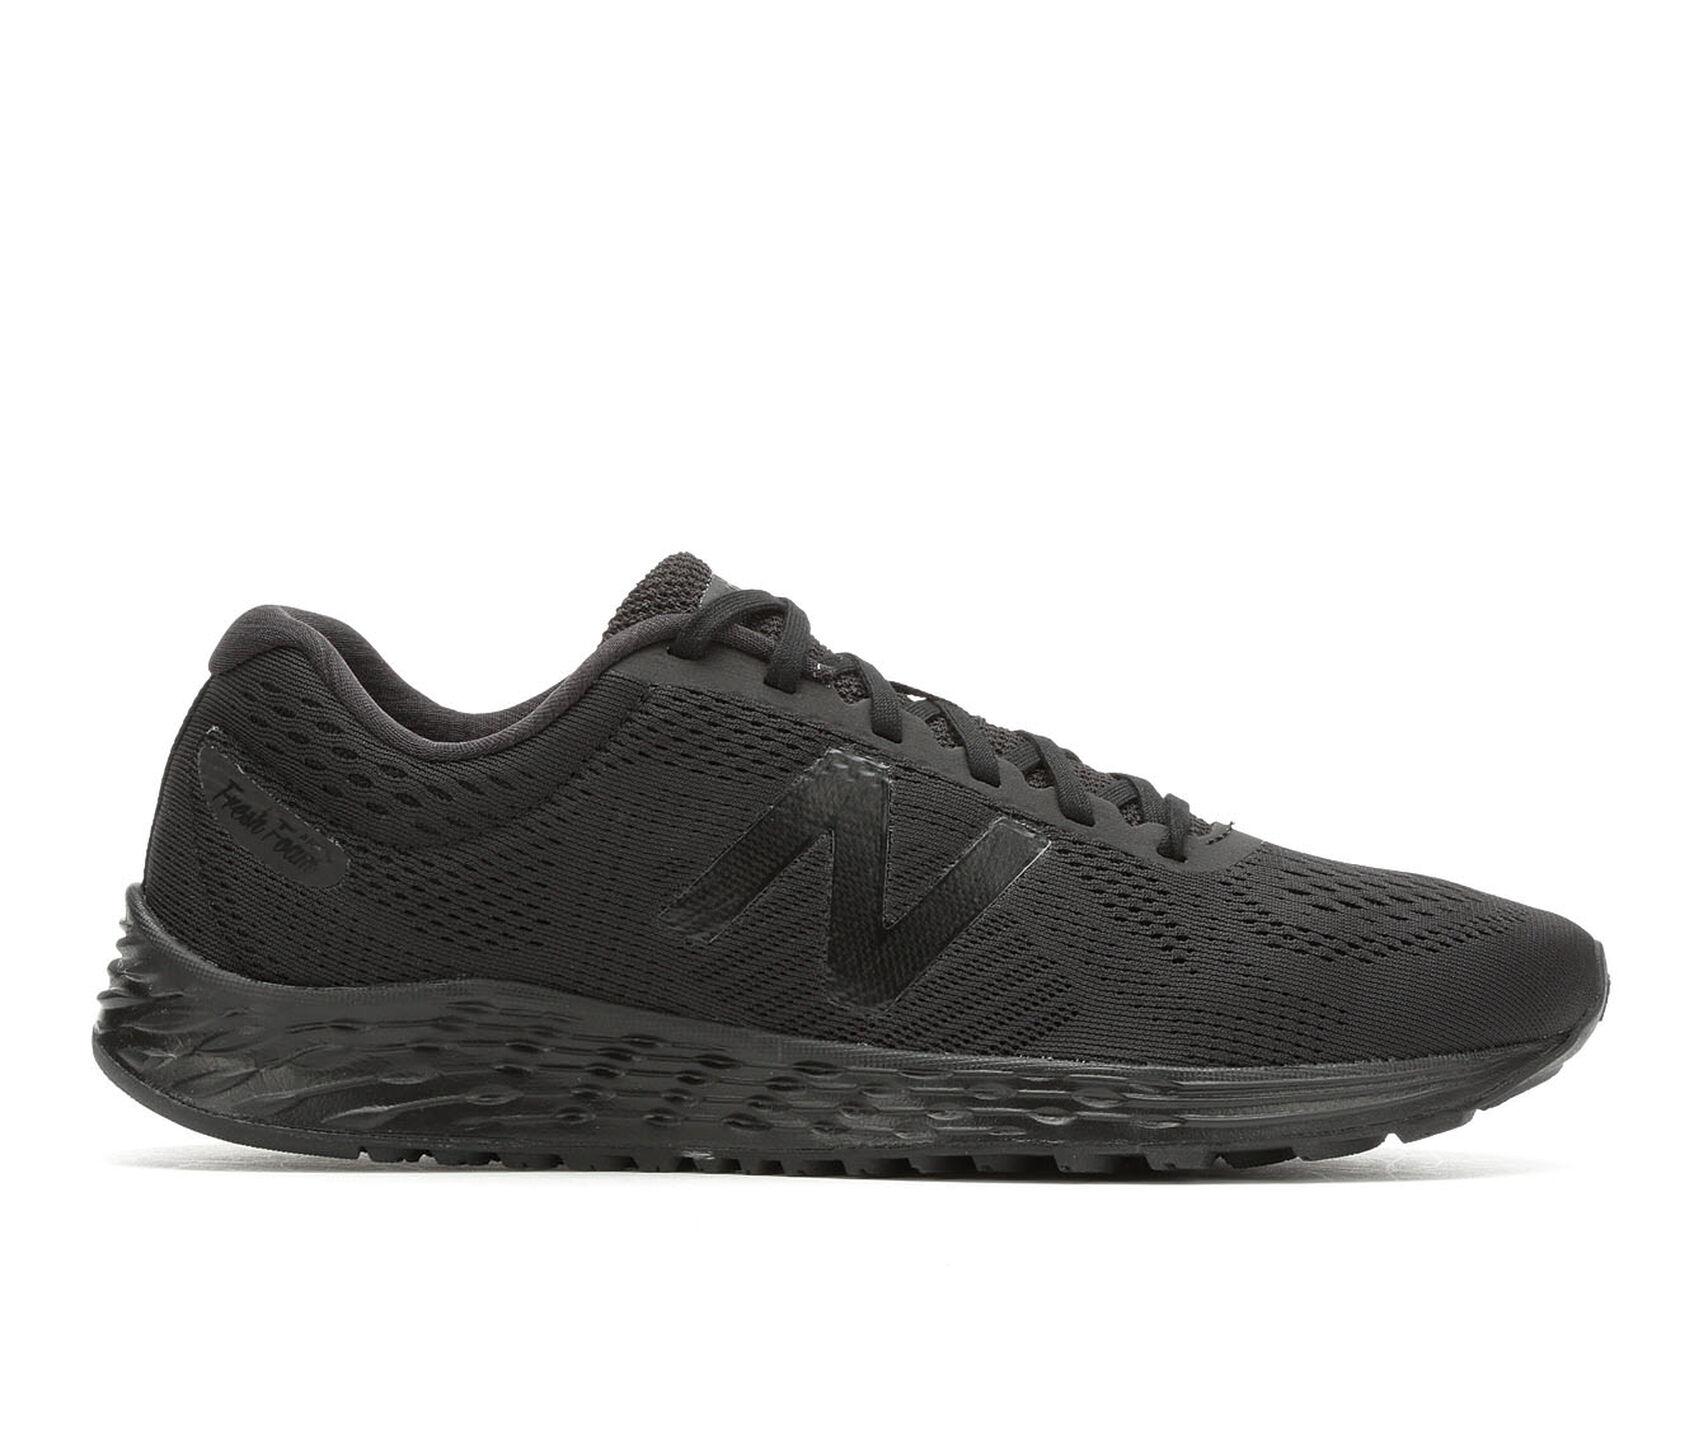 best sneakers 1a511 d54a6 Men's New Balance Arishi Running Shoes